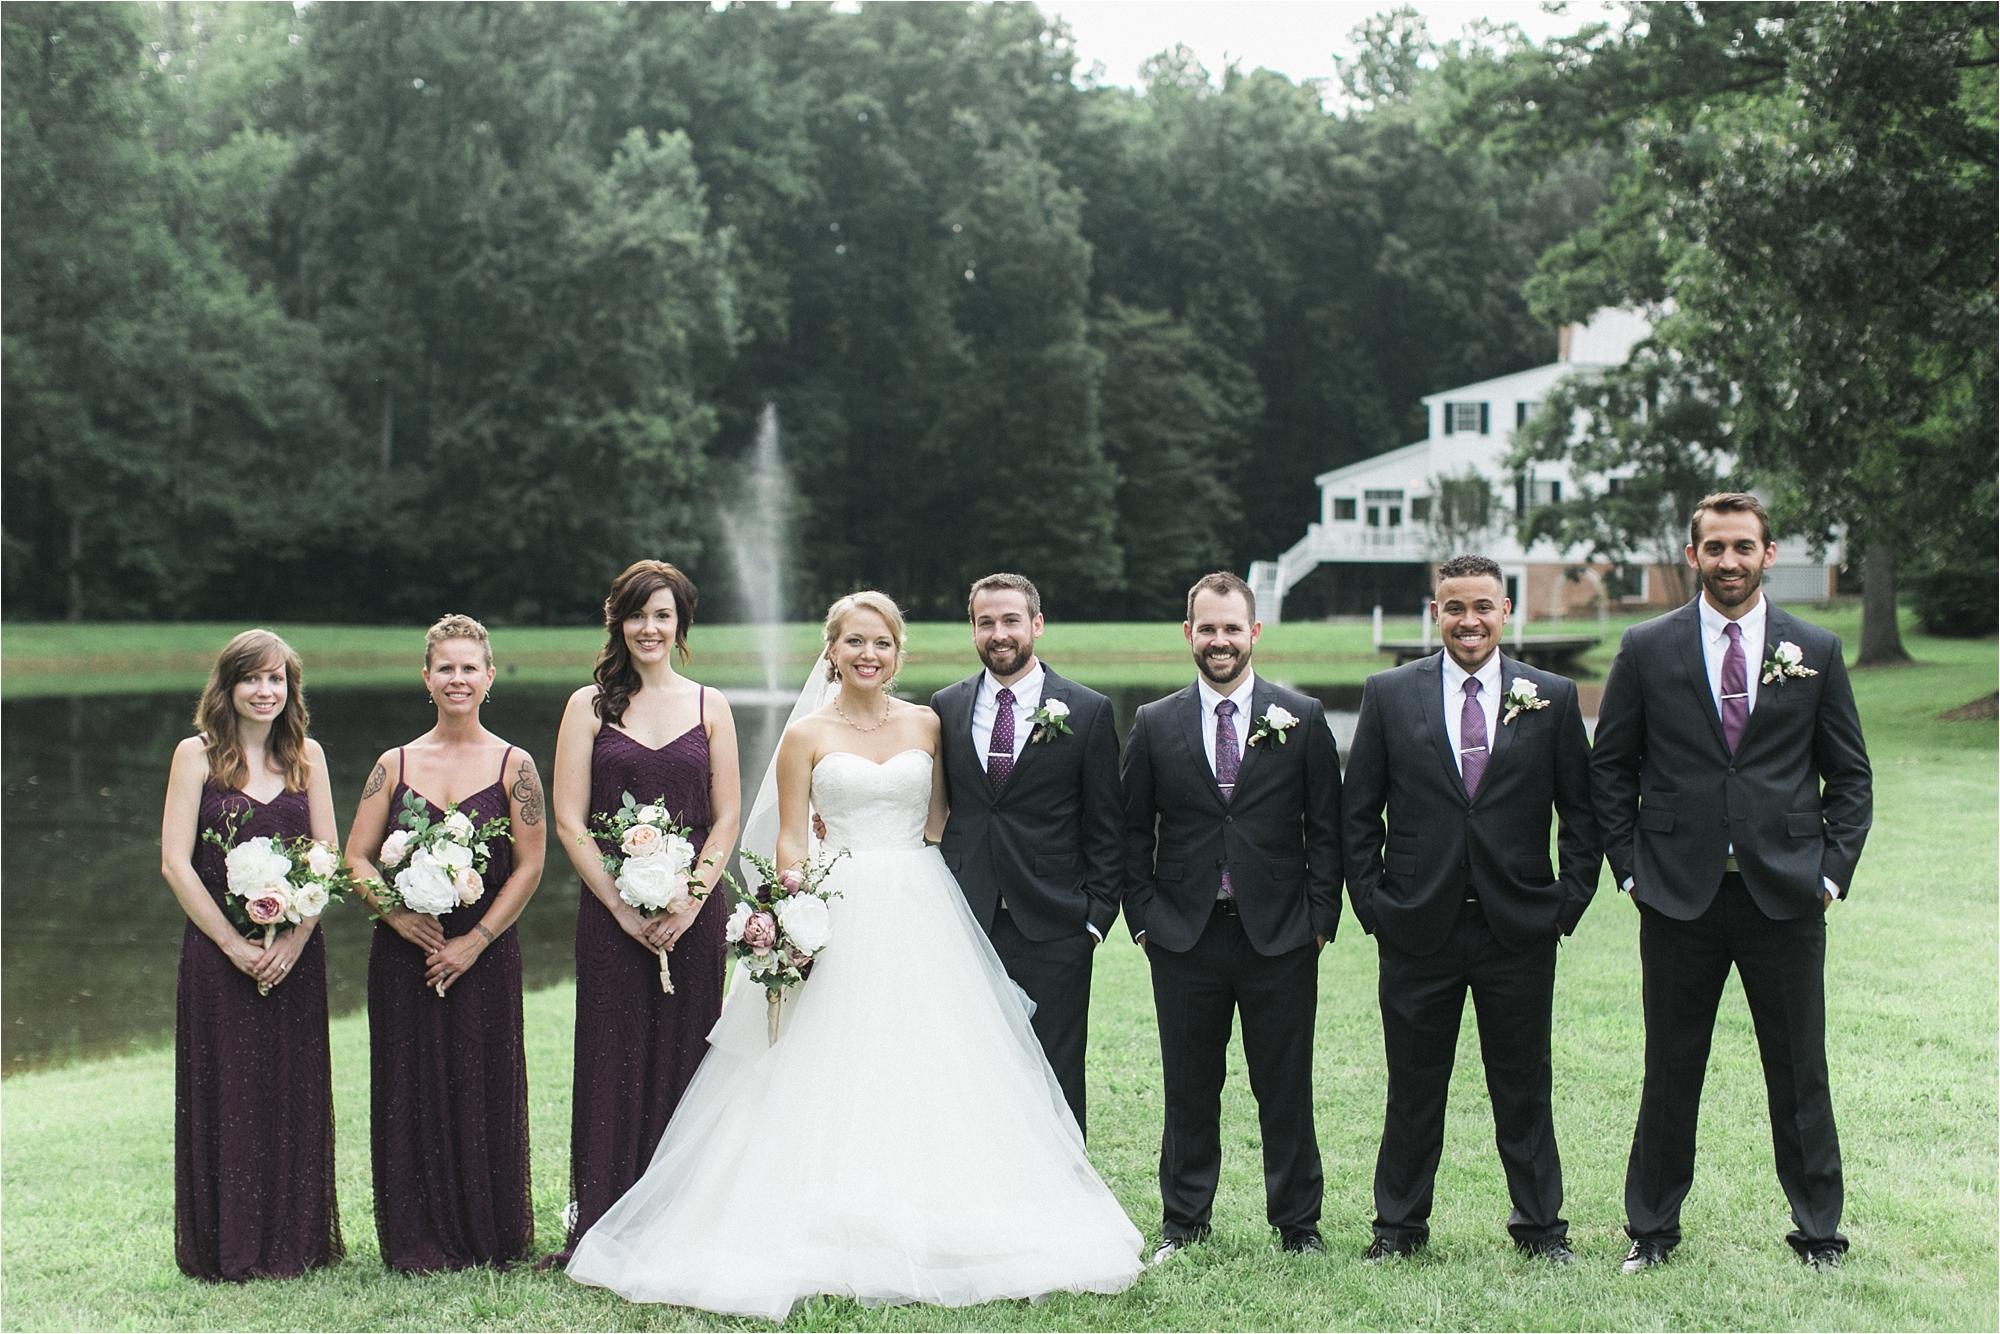 fredericksburg-virginia-stevenson-ridge-wedding-stephanie-yonce-photo_0031.jpg